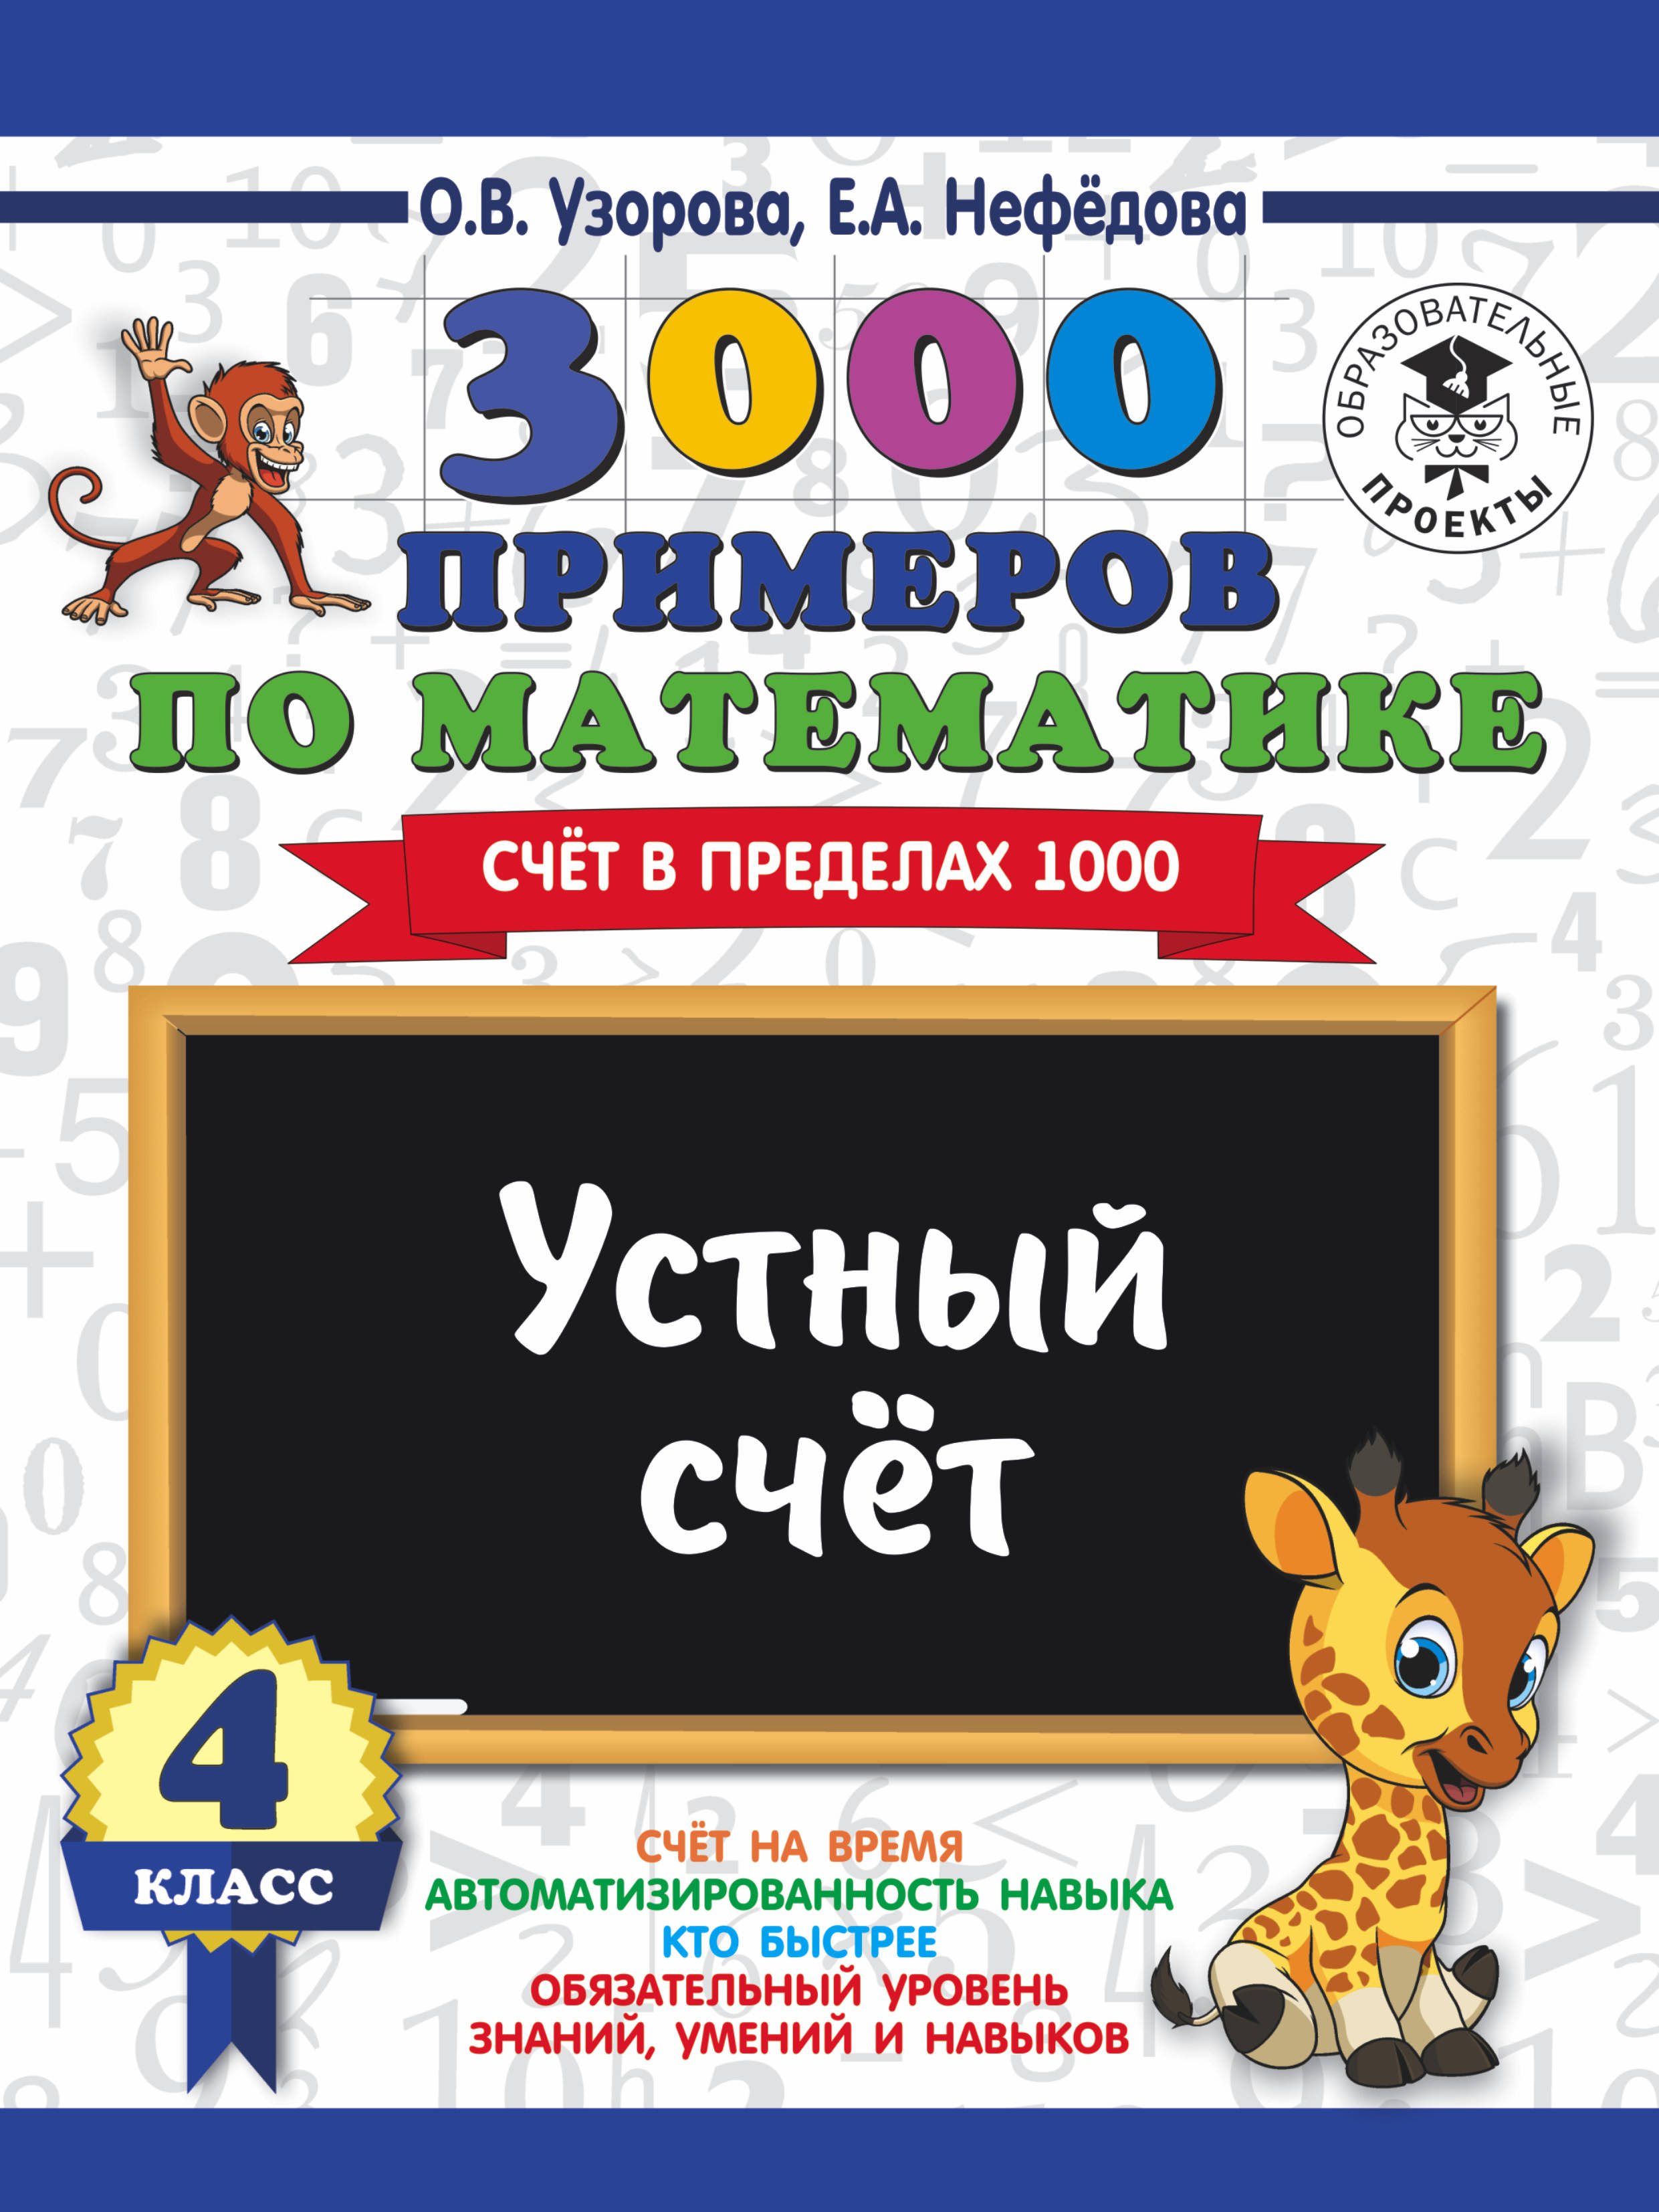 О. В. Узорова, Е. А. Нефедова Математика. 4 класс. Устный счет. Счет в пределах 1000